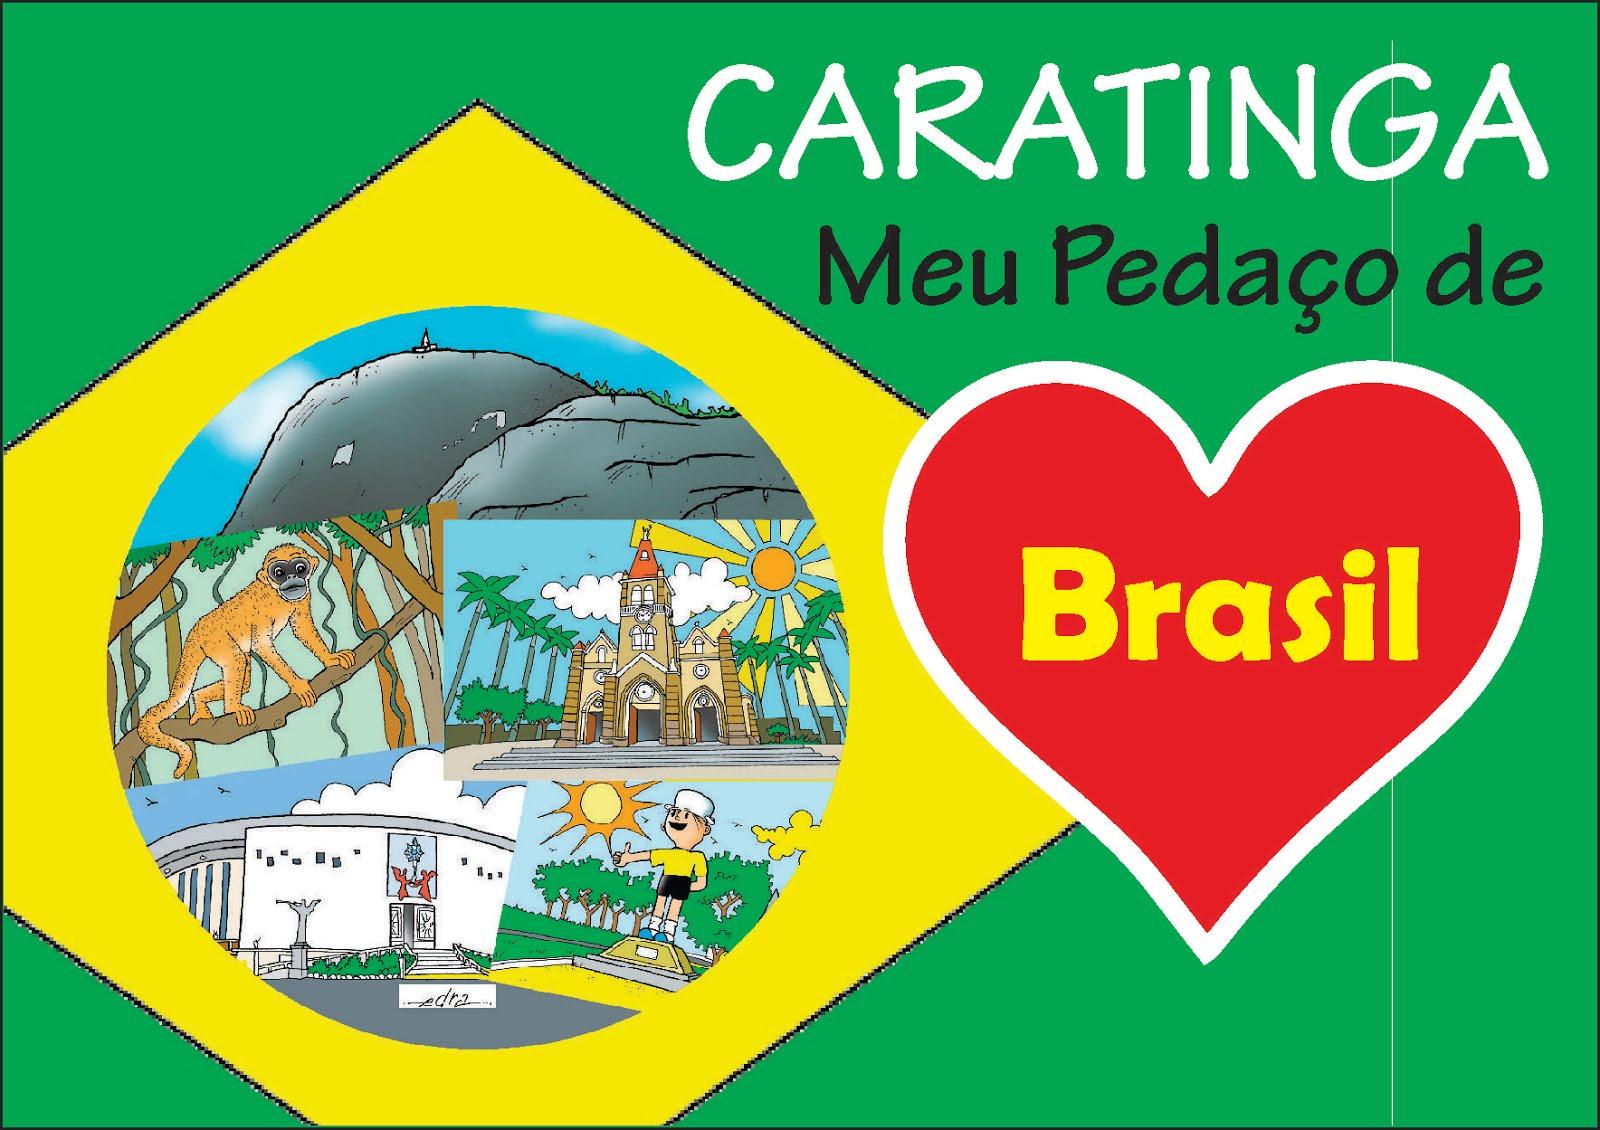 Caratinga, Meu Pedaço de Brasil